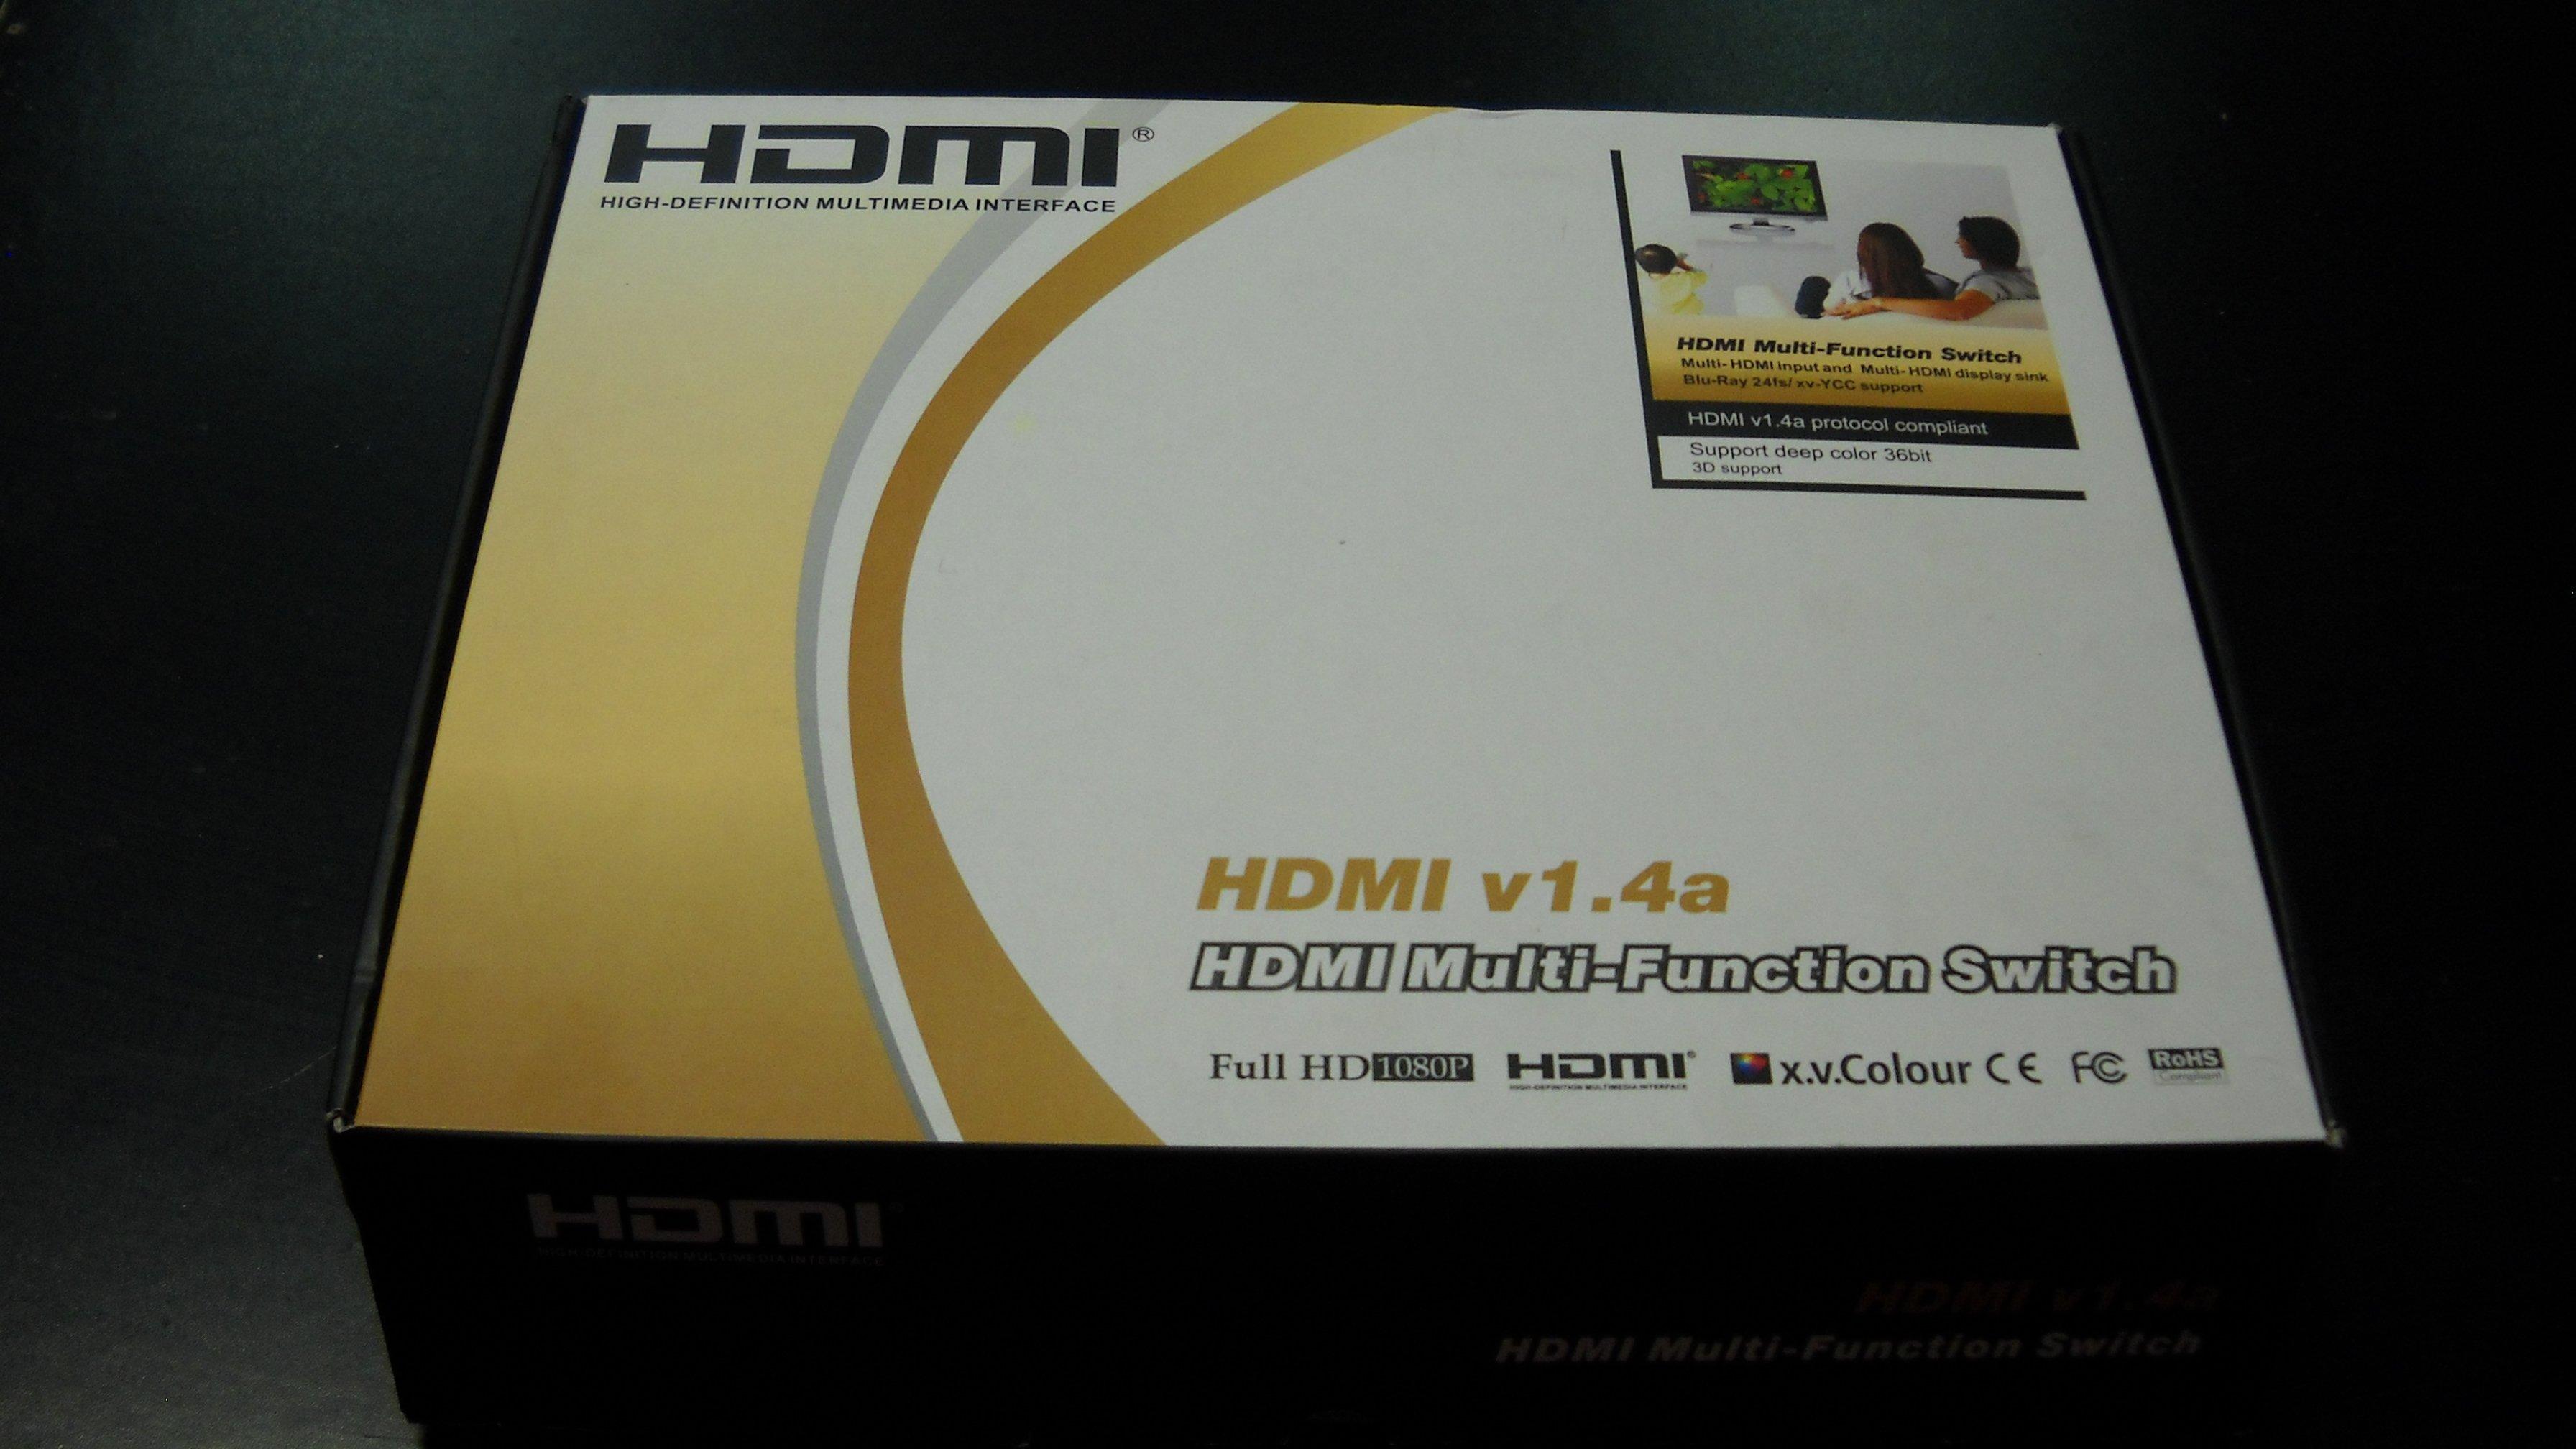 Rozdzielacz HDMI 1x4 n cyfra+ polsat itp. v1.4a ```````````` Opole AlleOpole.pl